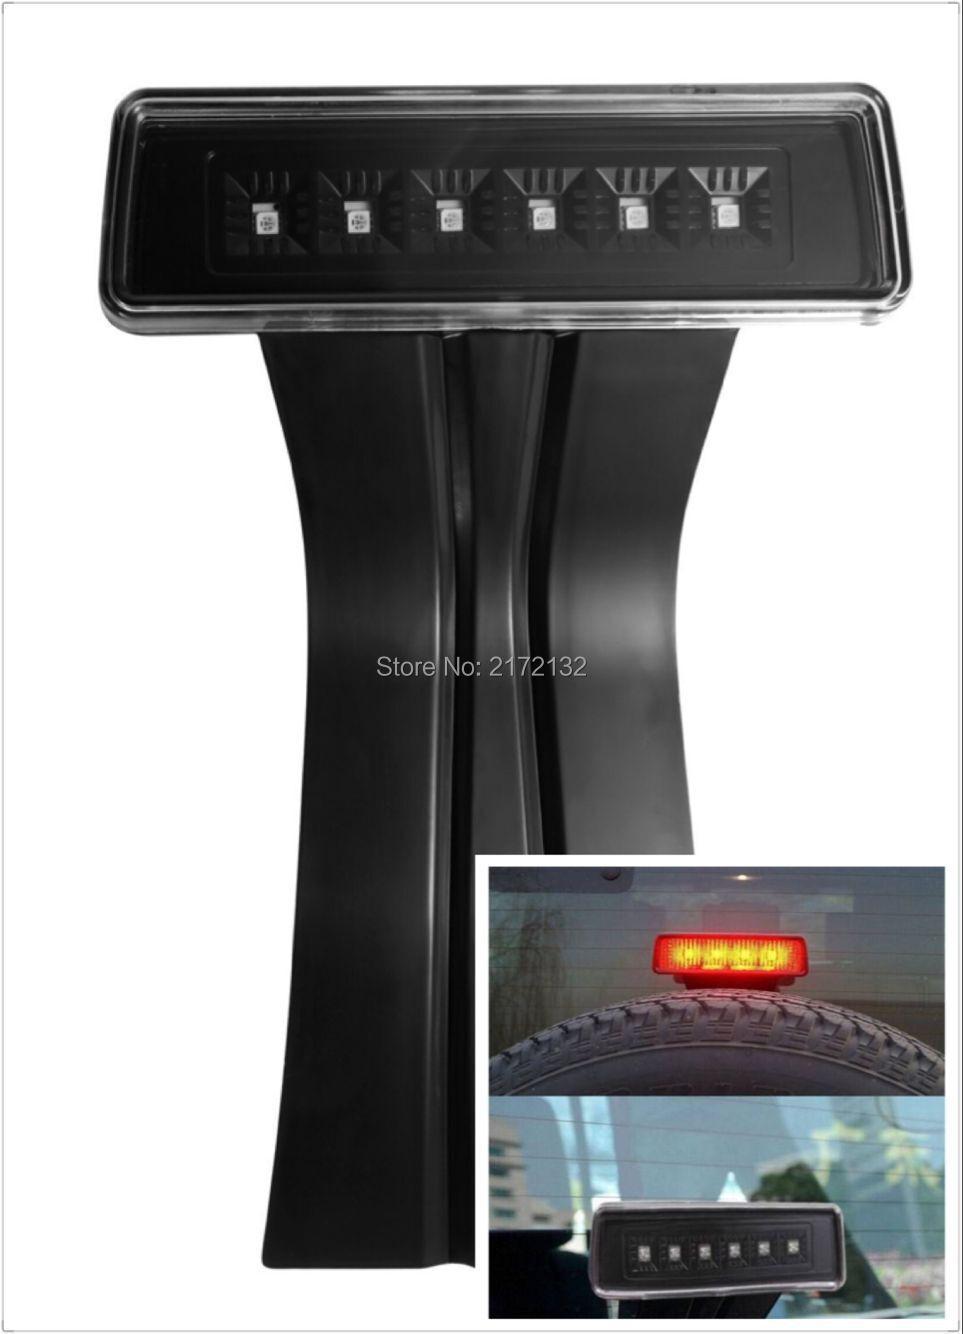 ФОТО 1pcs 15W Clear 6 LED Rear Tail 3rd Brake Light Third Brake Lamp for Jeep Wrangler JK 07-15